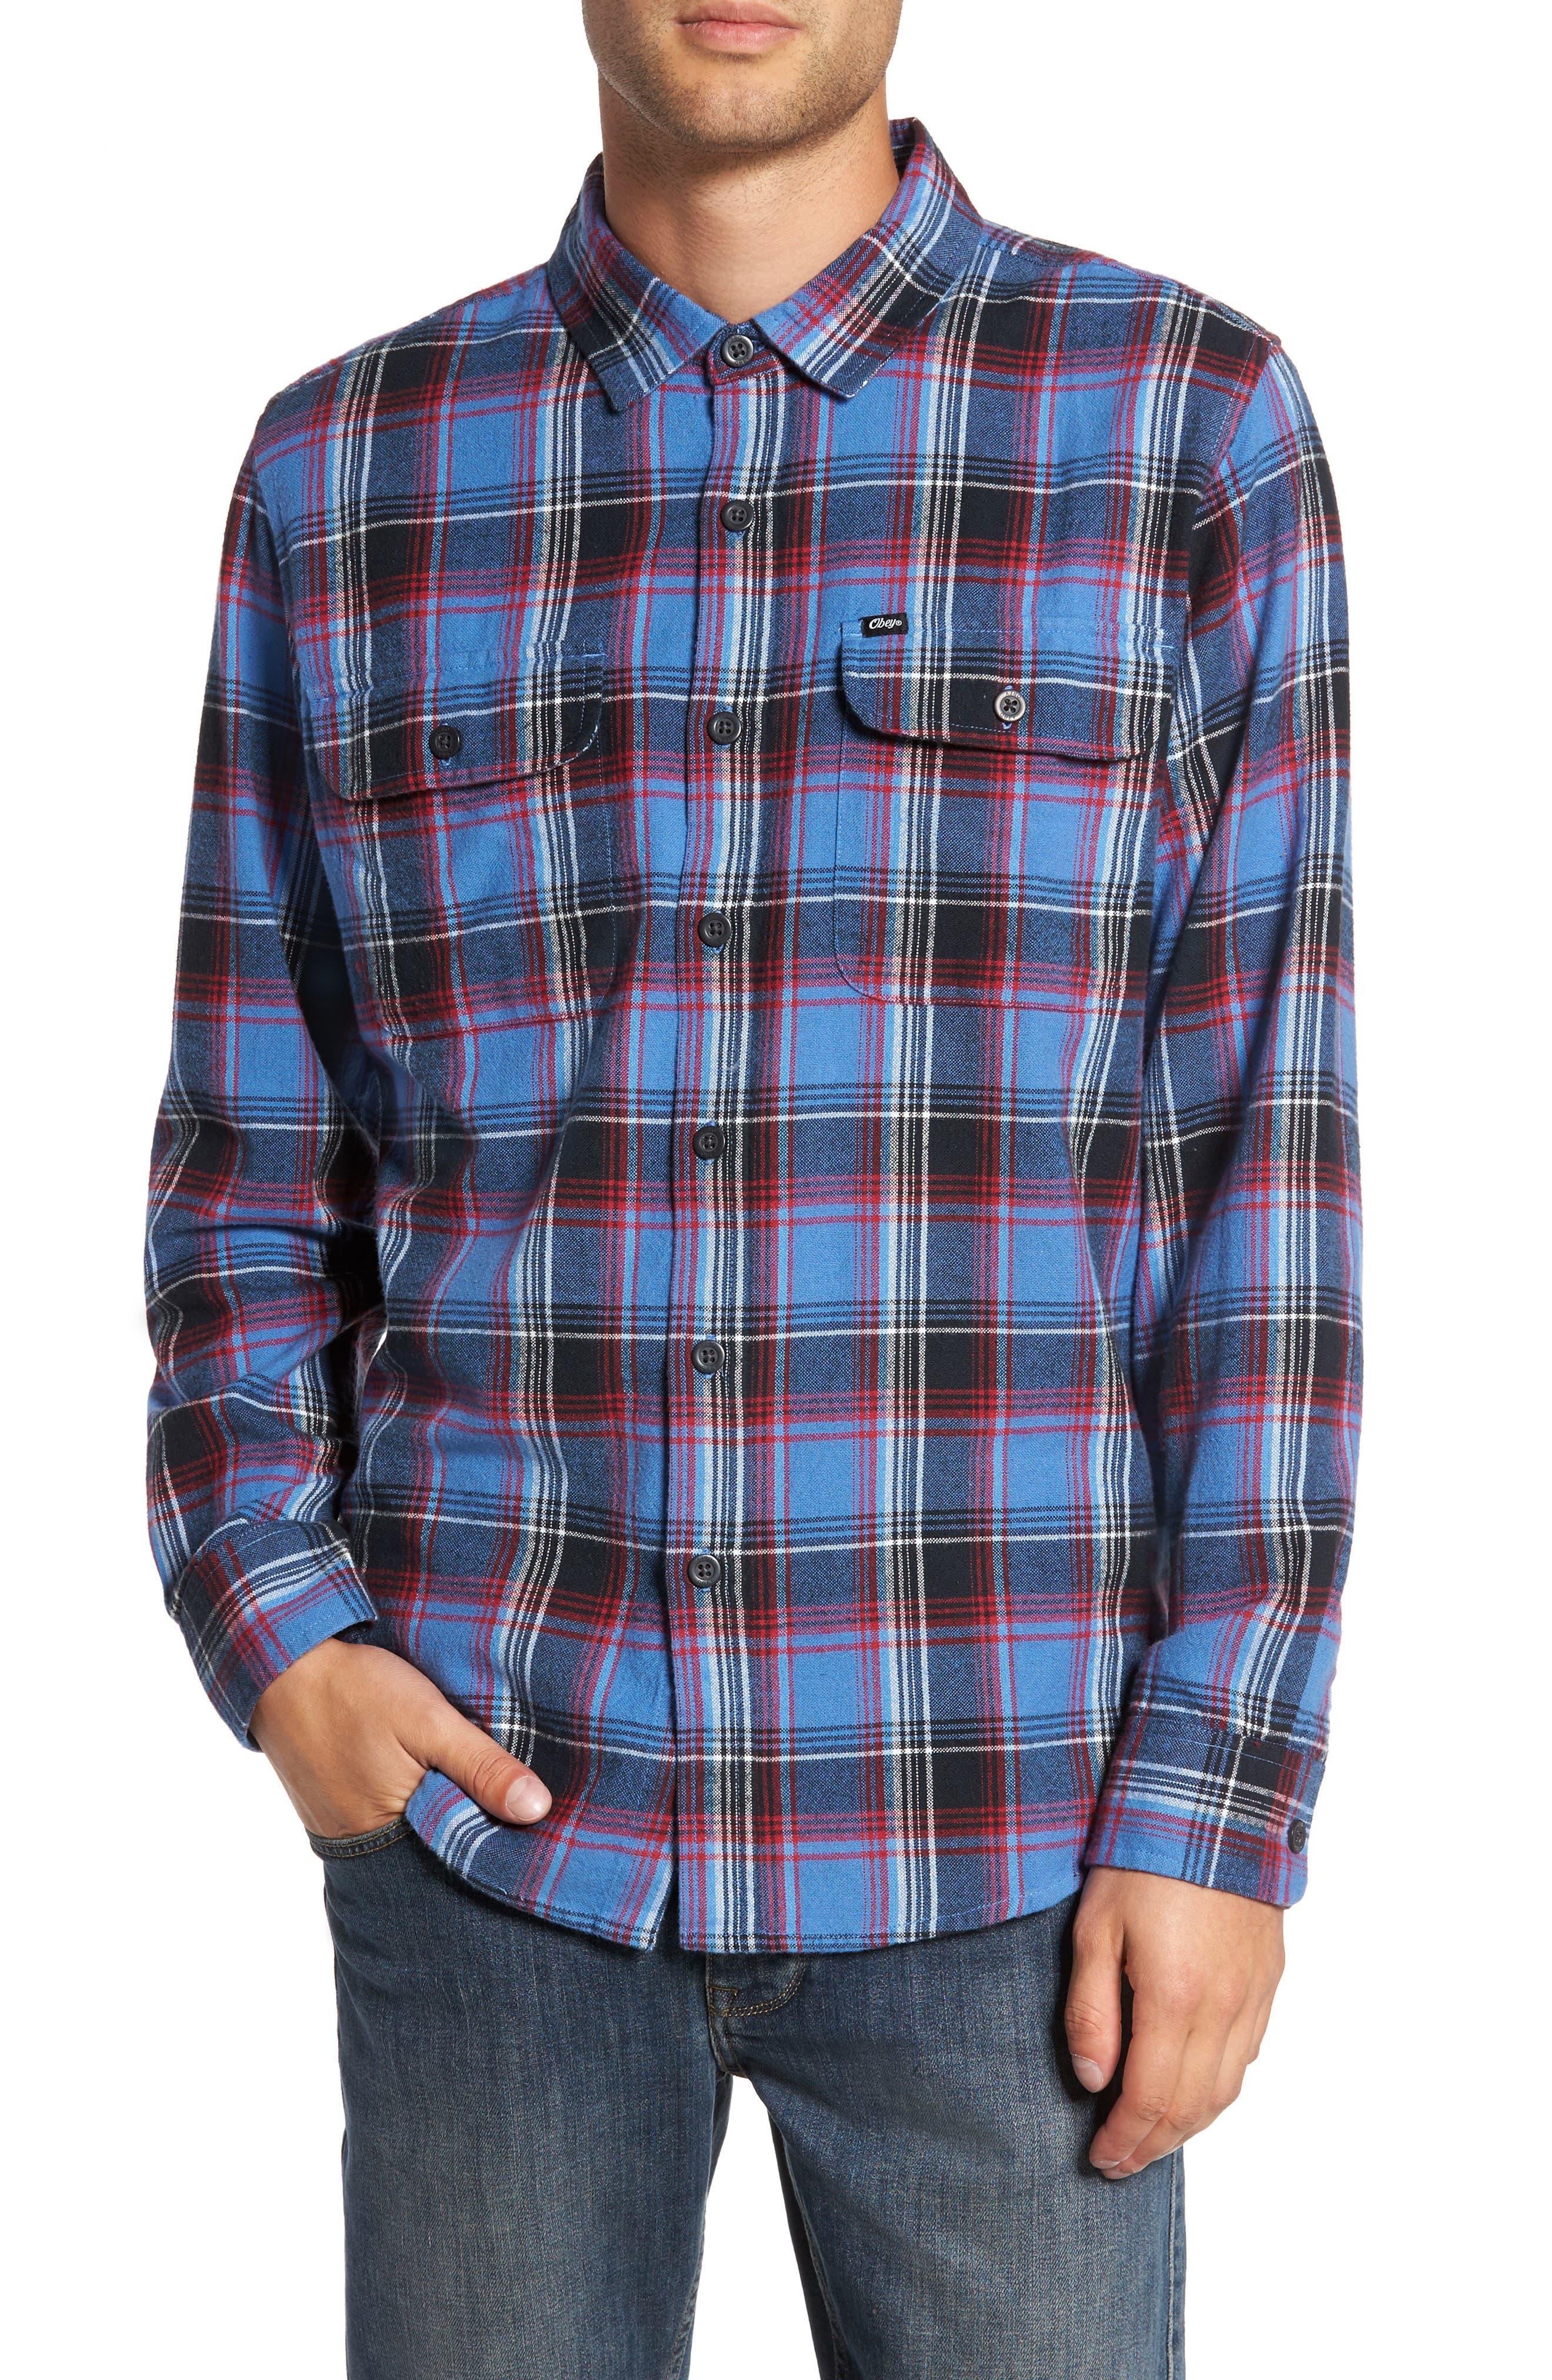 Marvyn Plaid Woven Shirt,                         Main,                         color, Navy Multi